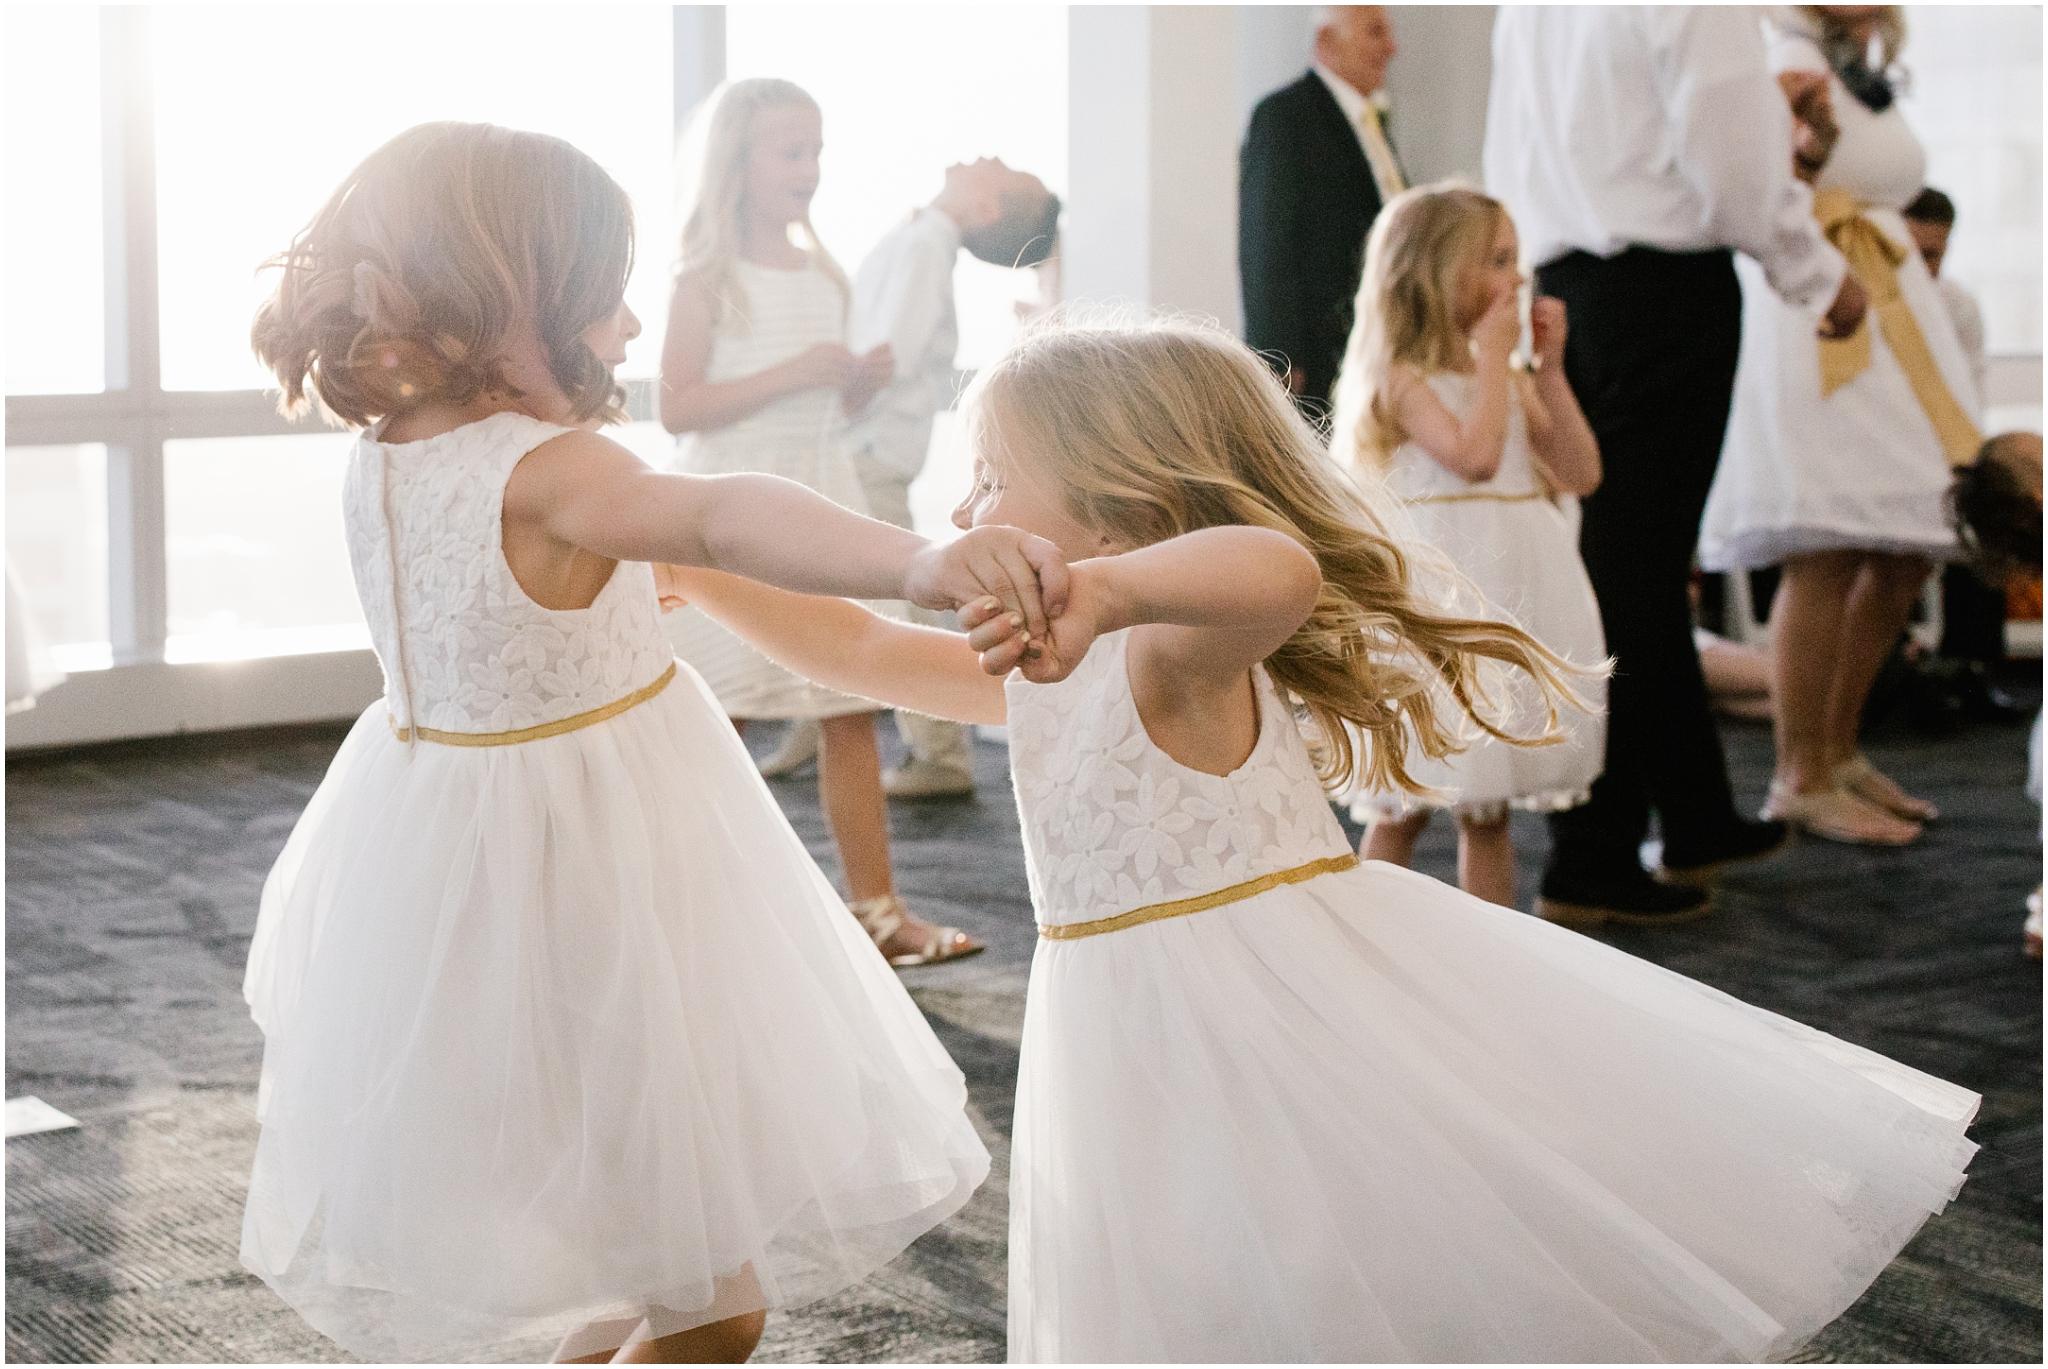 CherylandTyler-591_Lizzie-B-Imagery-Utah-Wedding-Photographer-Salt-Lake-City-Temple-Wells-Fargo-Building-Reception.jpg